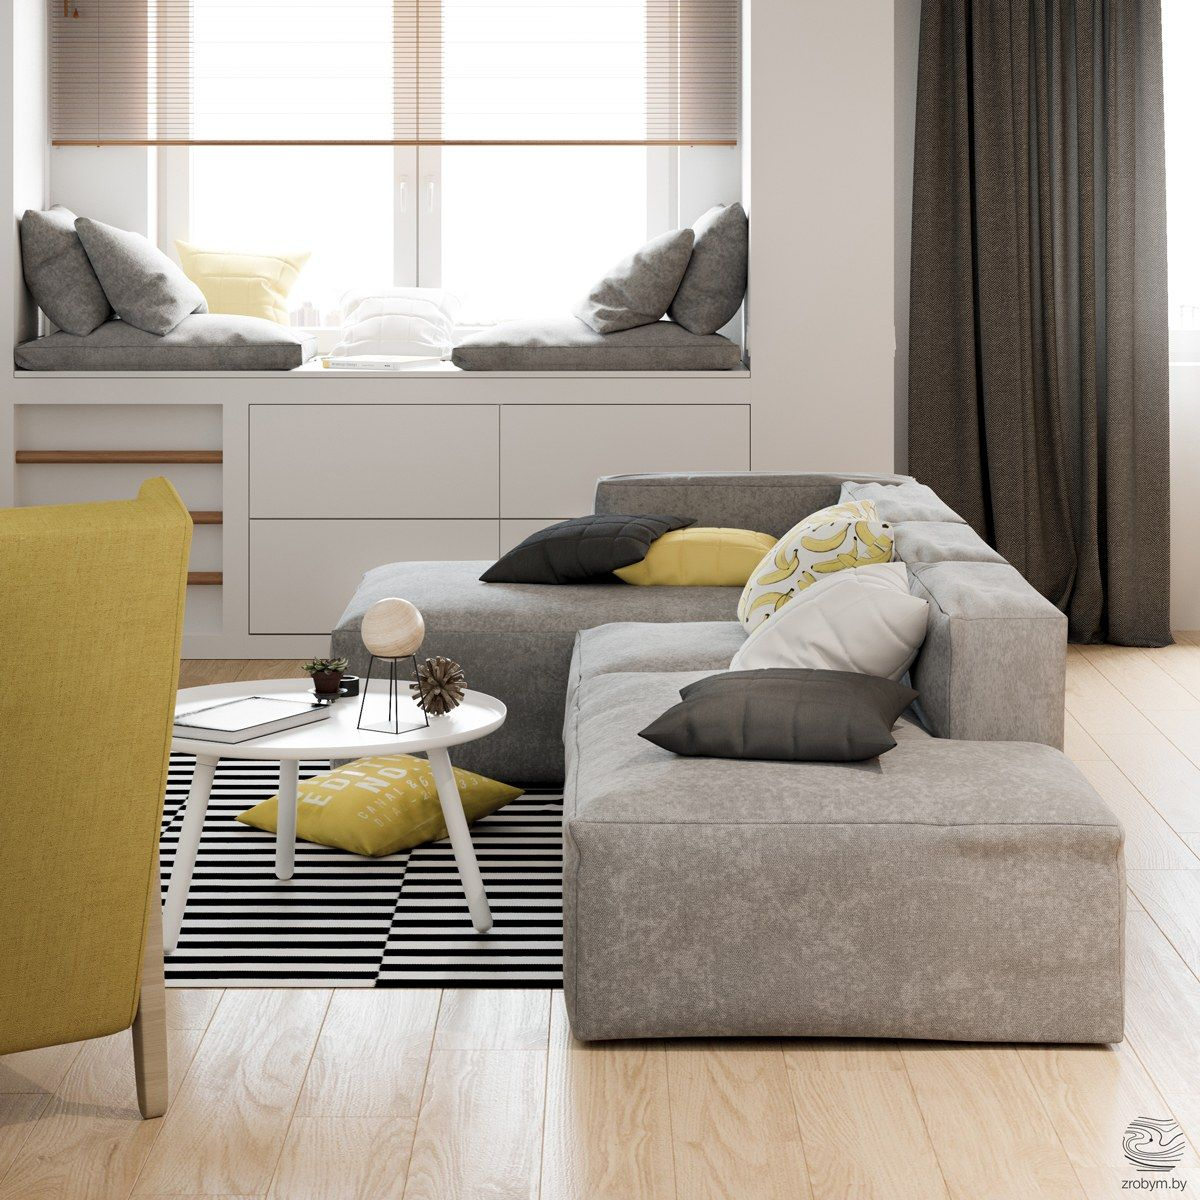 3 bedroom house interior design a beautiful  bedroom  bath house with floor plan  home decor